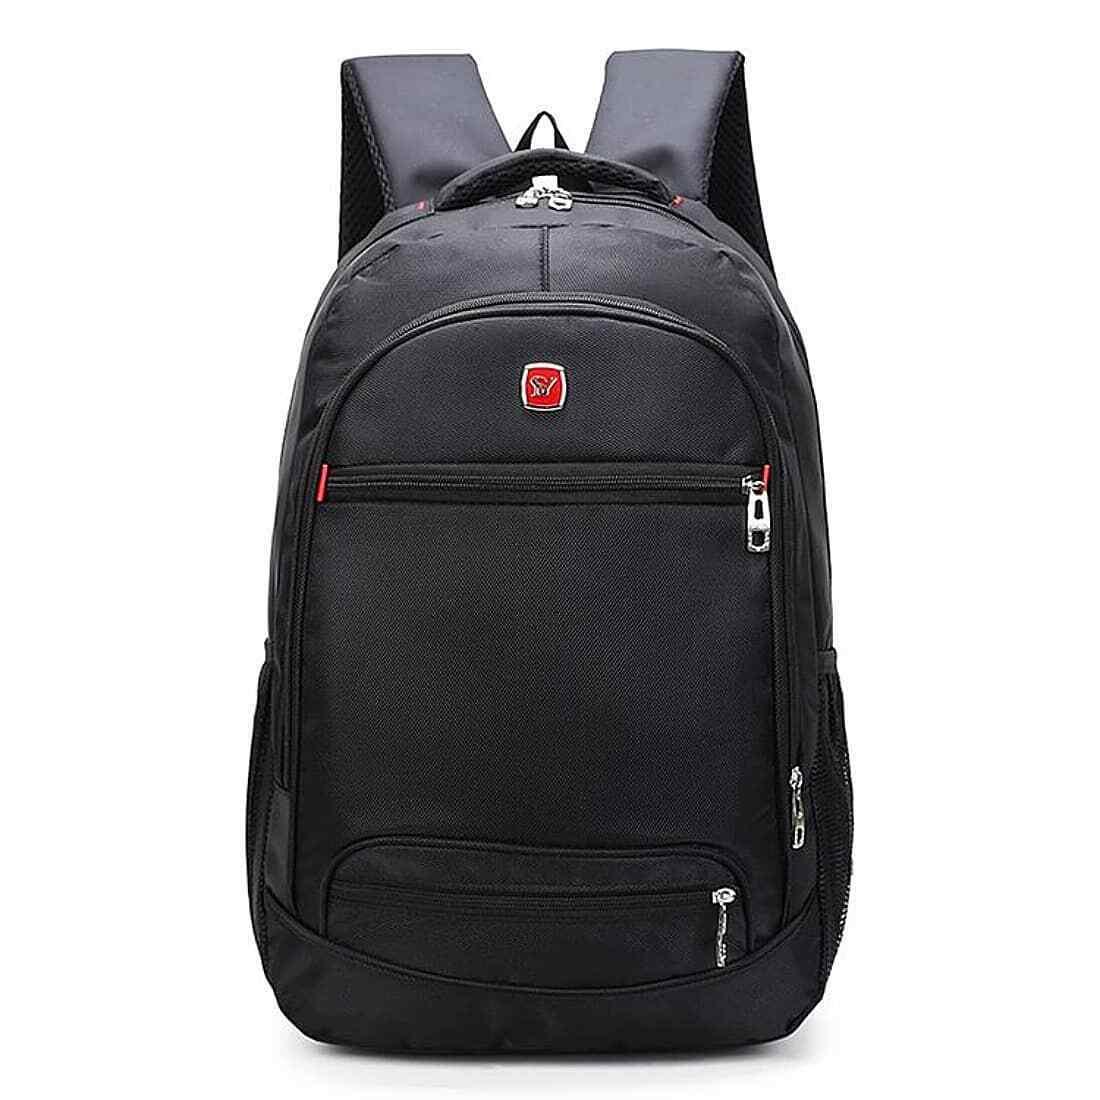 Notebook Laptop Rucksack Tasche Schule Arbeit 15 15,6 - 17 Zoll  25 Liter 30262